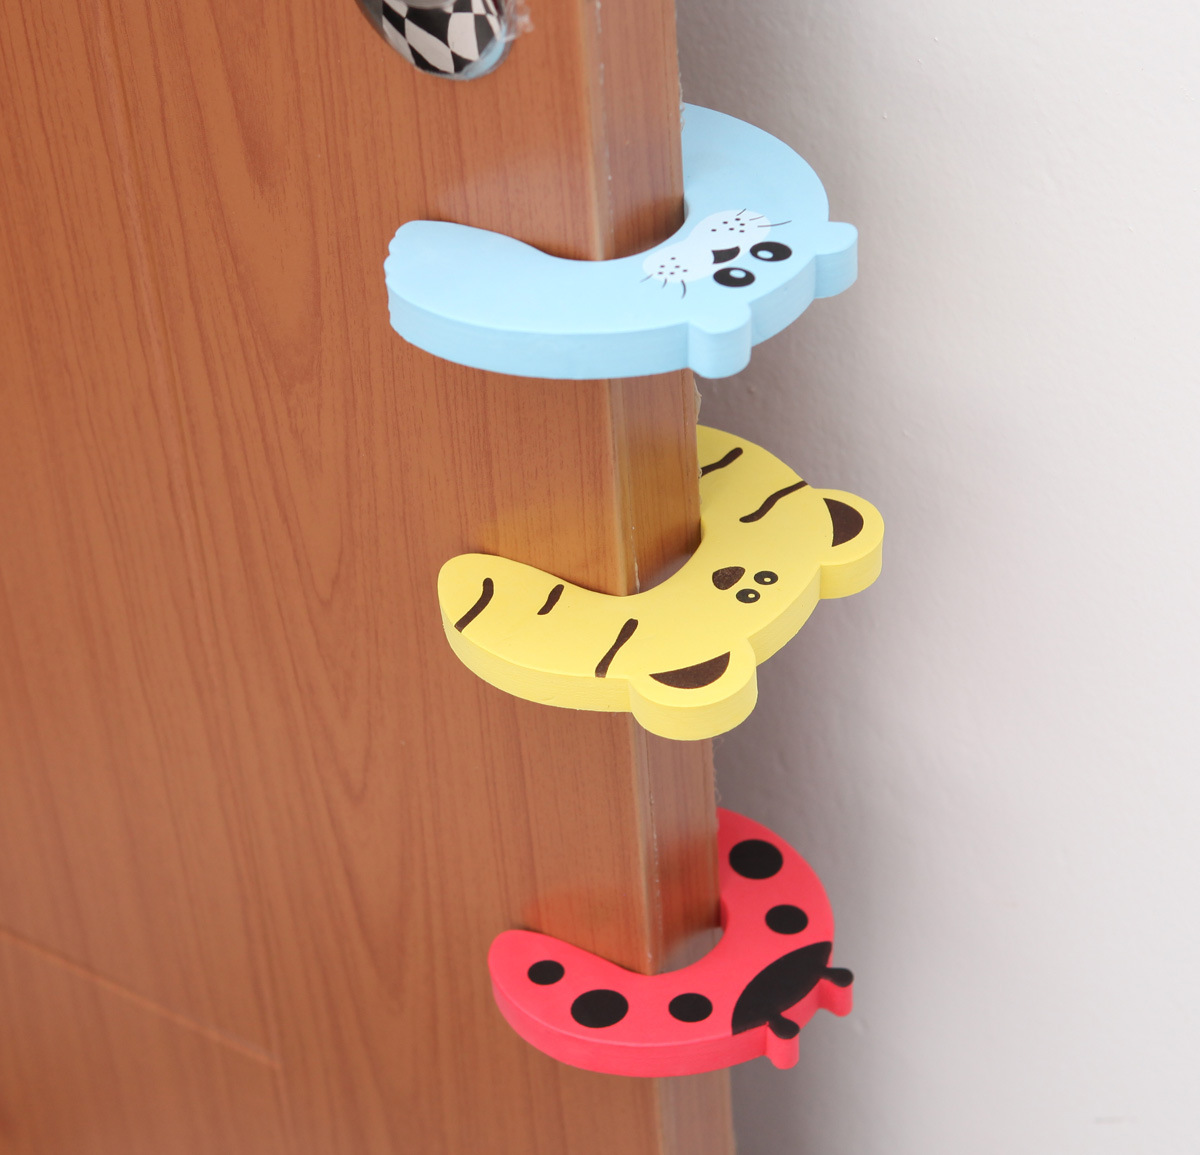 5 PCS Beideli Kids Baby Cartoon Animal Jammers Stop Edge Corner Guards Door Stopper Holder lock baby Safety Finger Protector